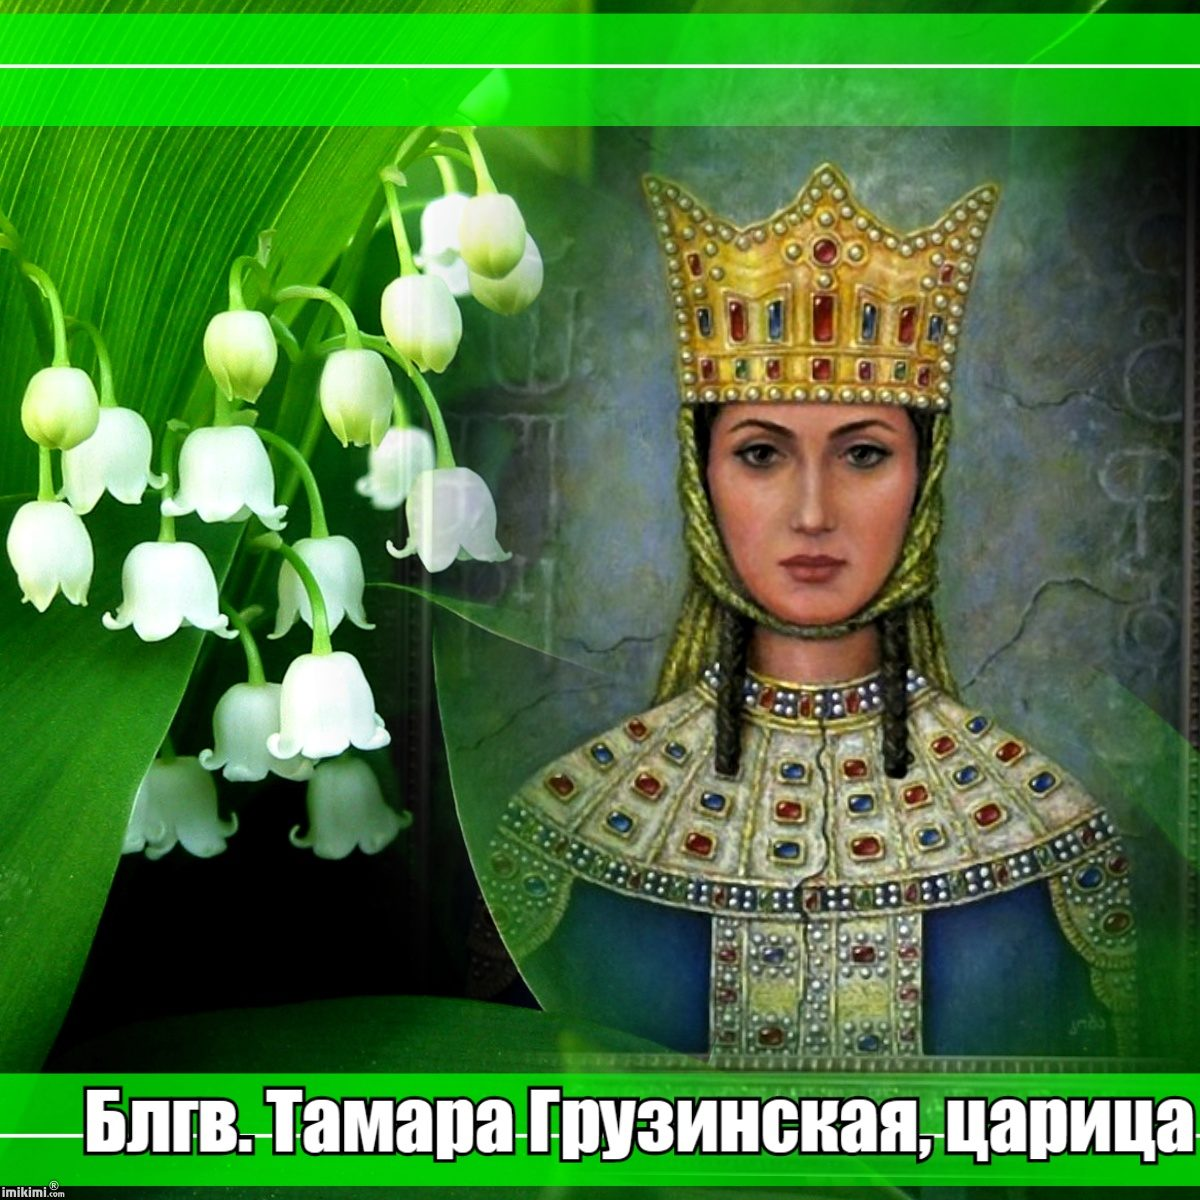 Картинки с королевским троном вашему